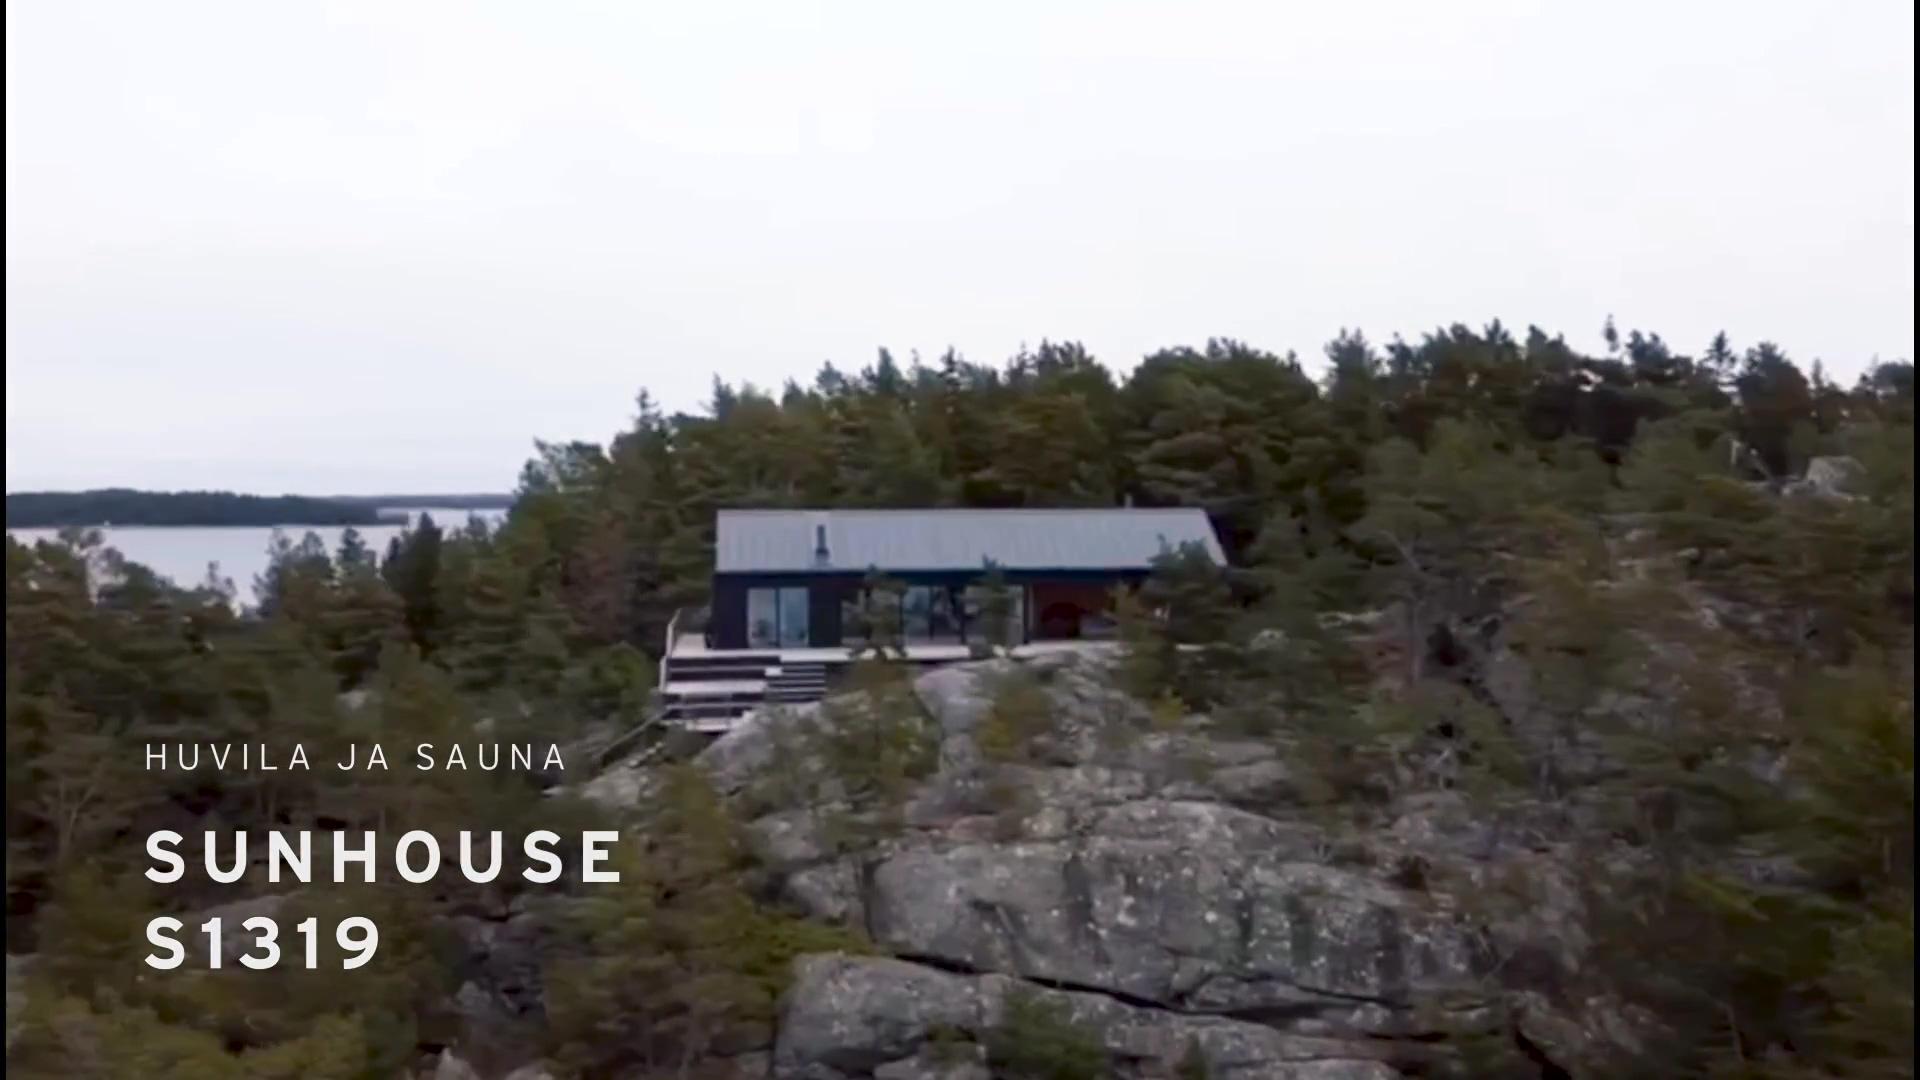 SUNHOUSE-S1319-huvila-ja-sauna